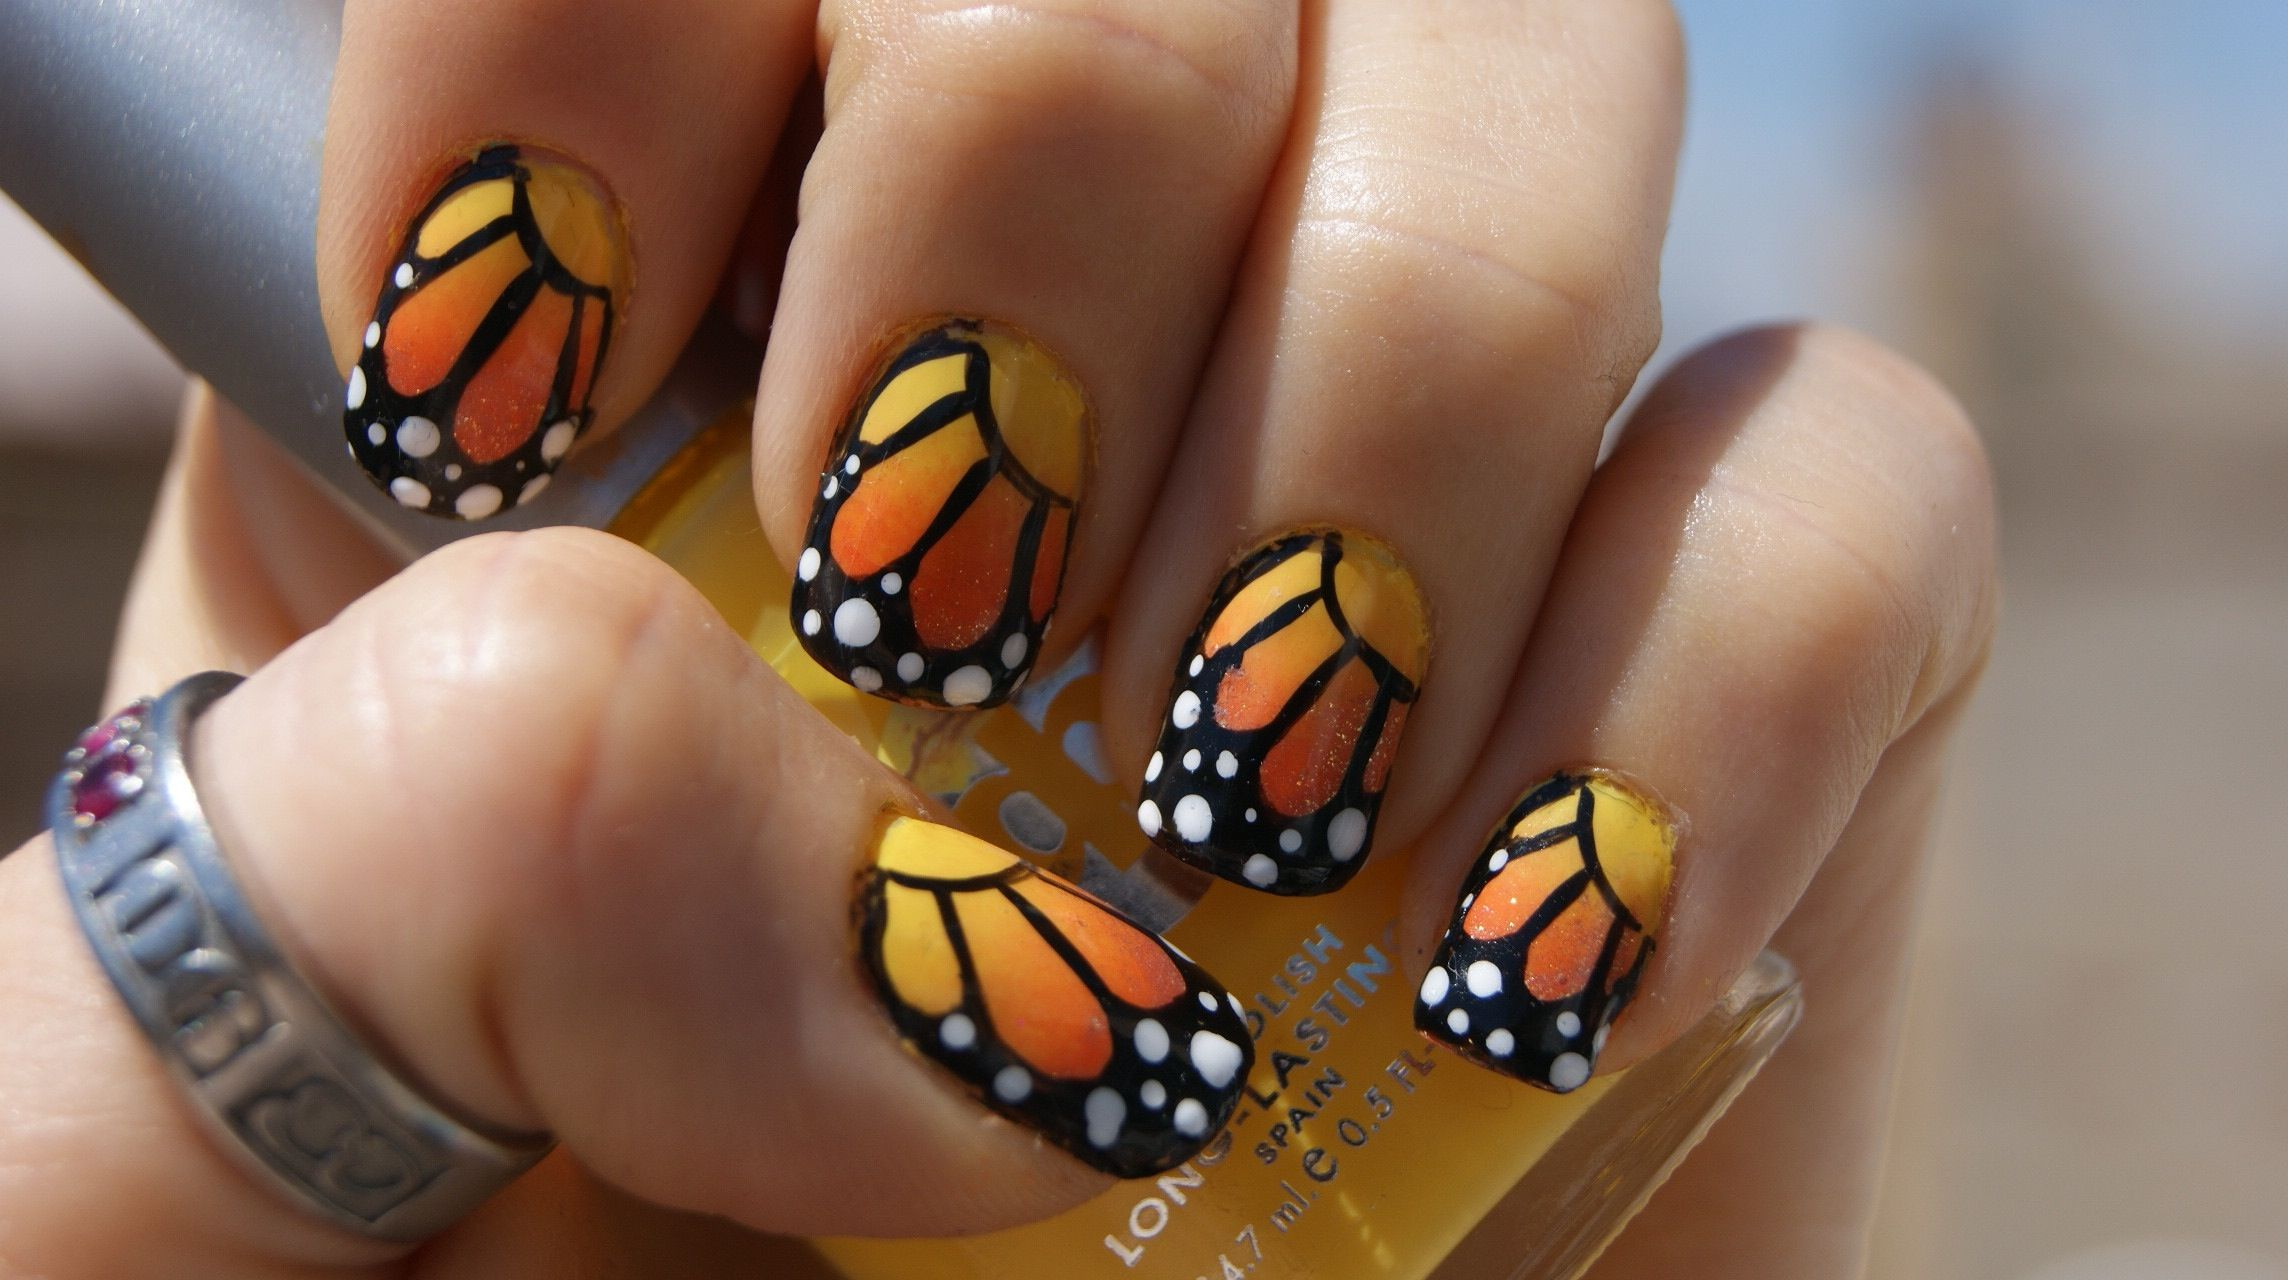 Migratory Monarch Butterfly Nail Art Butterfly Nail Art Neon Nail Art Designs Easter Nail Designs